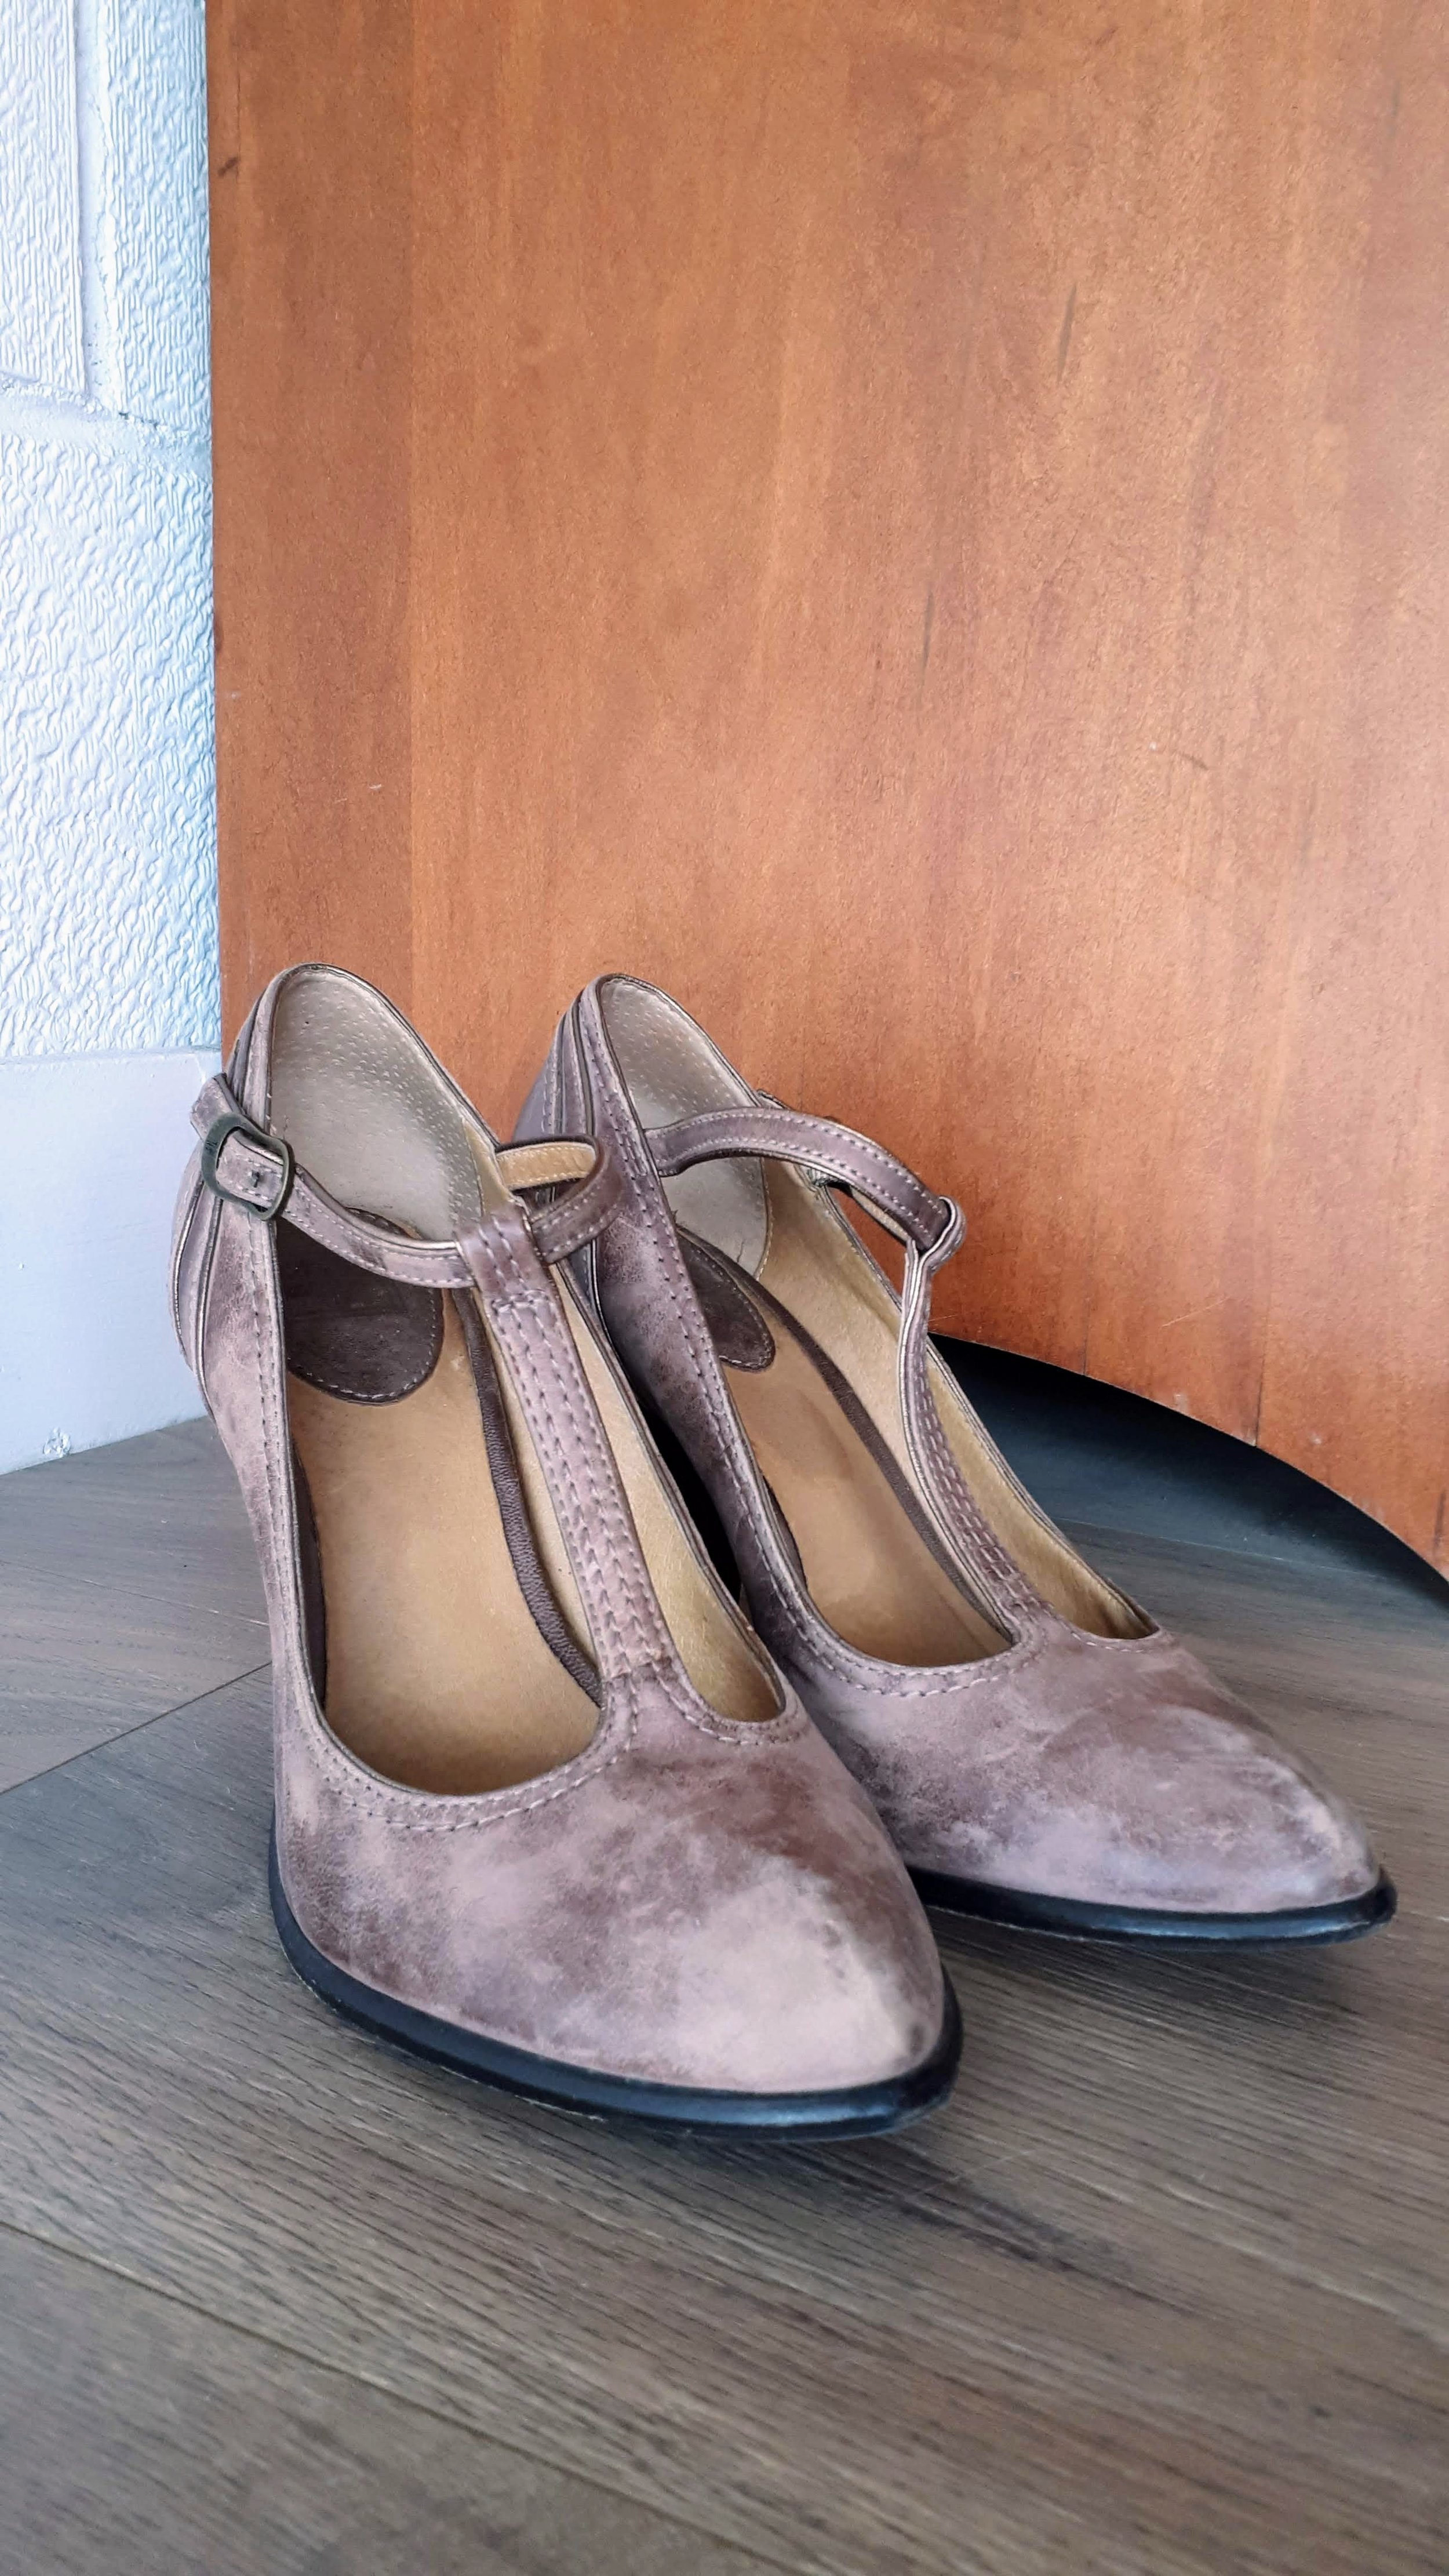 Frye shoes; Size 10, $62